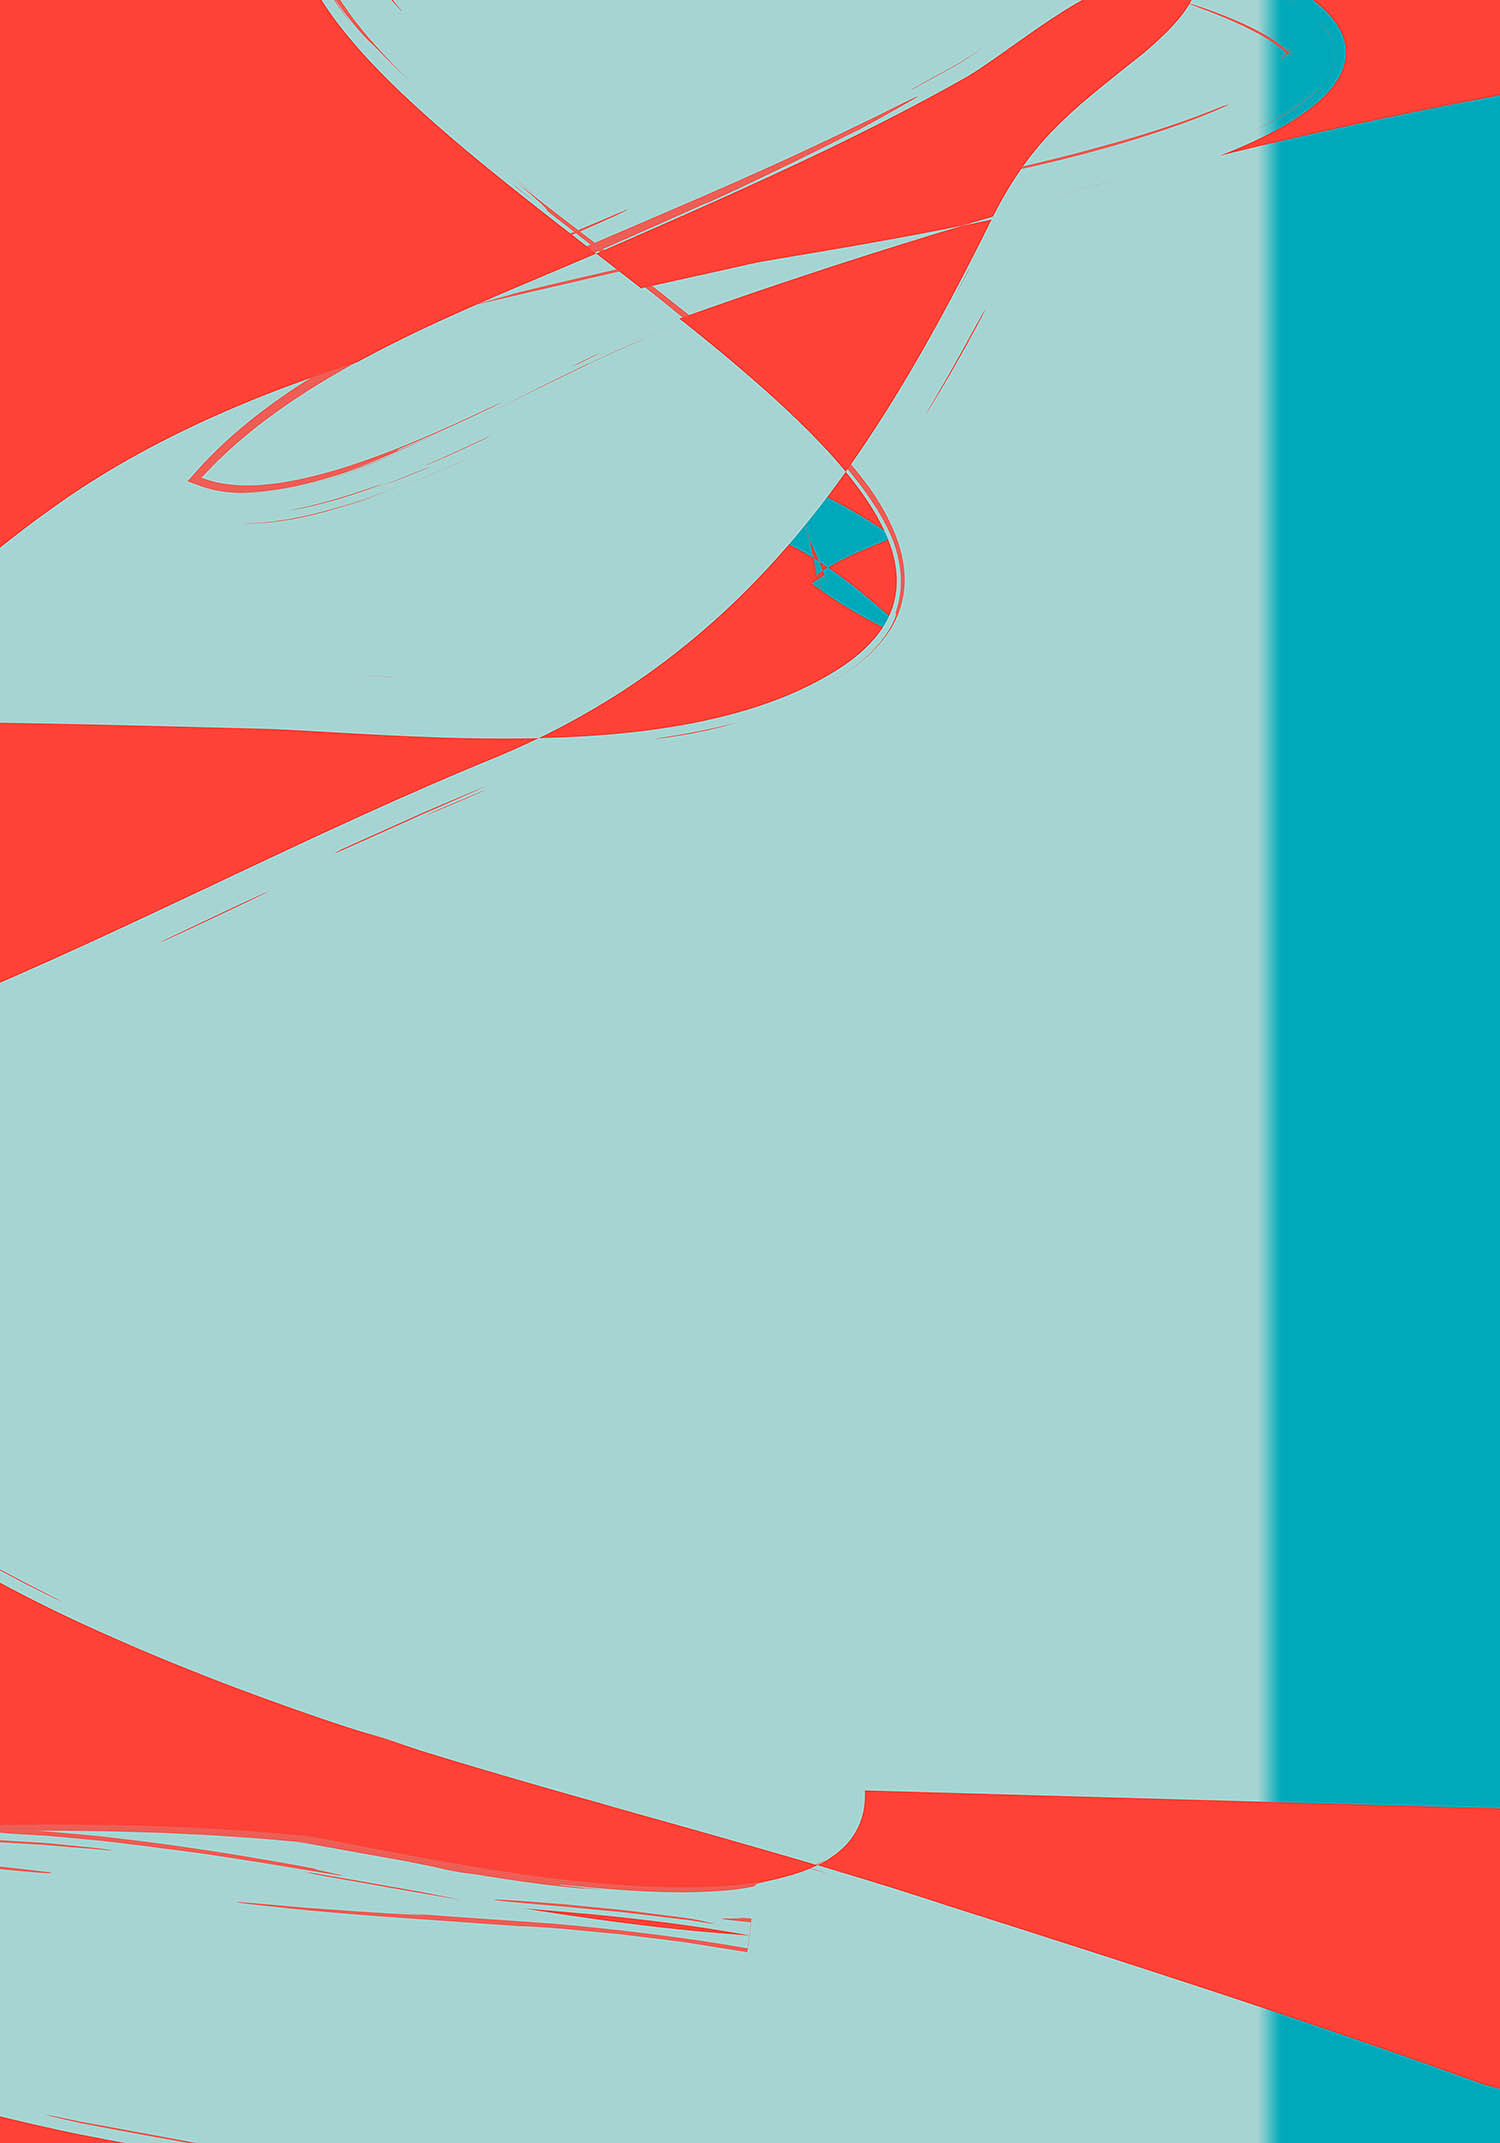 oB 42 by greek multidisciplinary artist Kostas Gogas